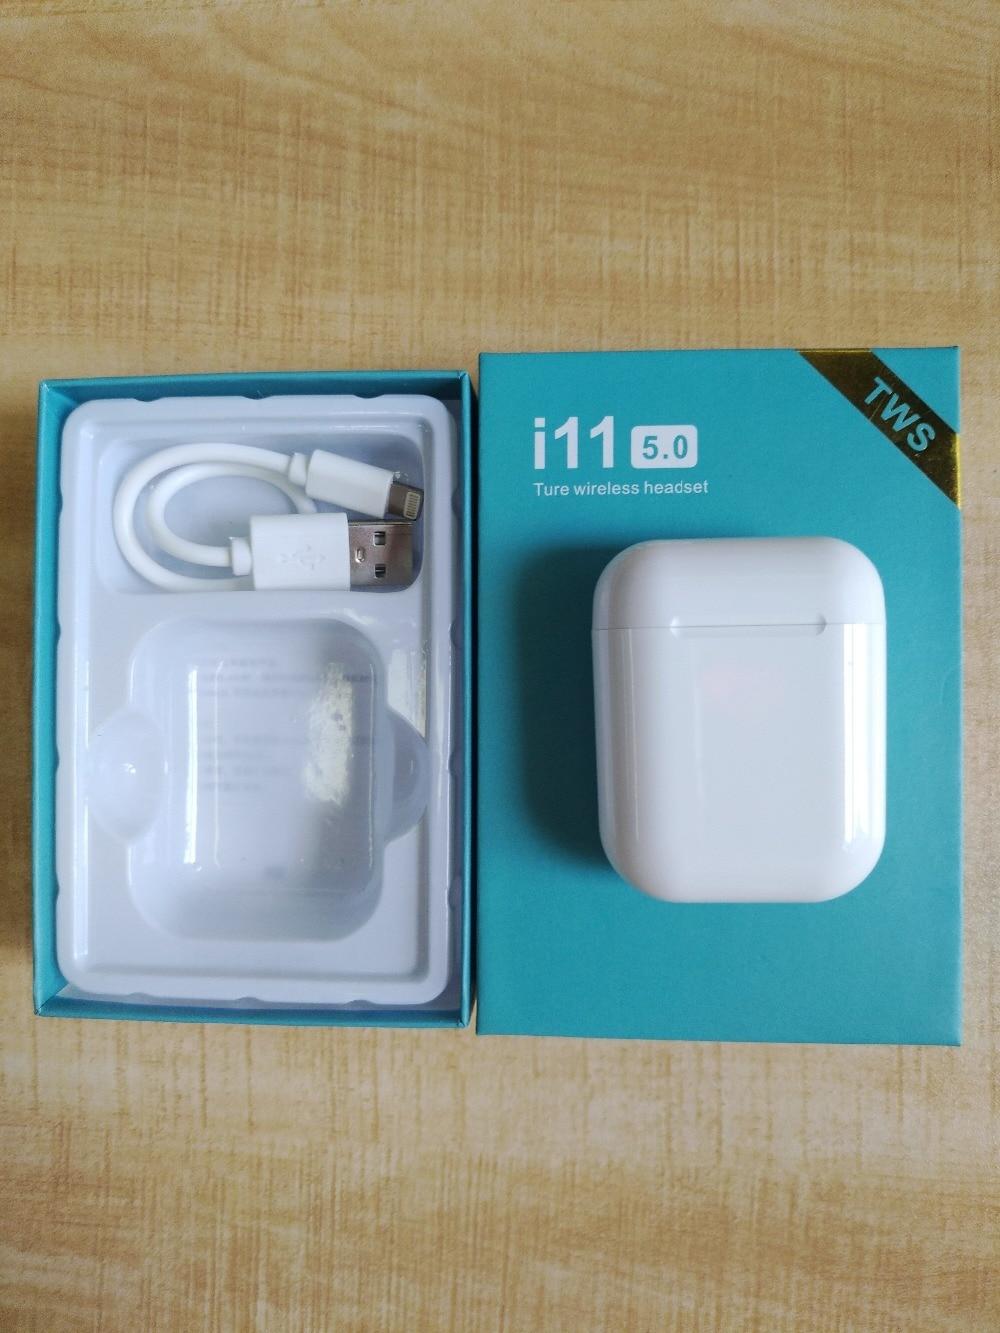 Original I11 Tws I9s Tws I10max Earphone 1:1 TWS Wireless Bluetooth 5.0 Earphone Super Bass Stereo Earbud For Iphone Android